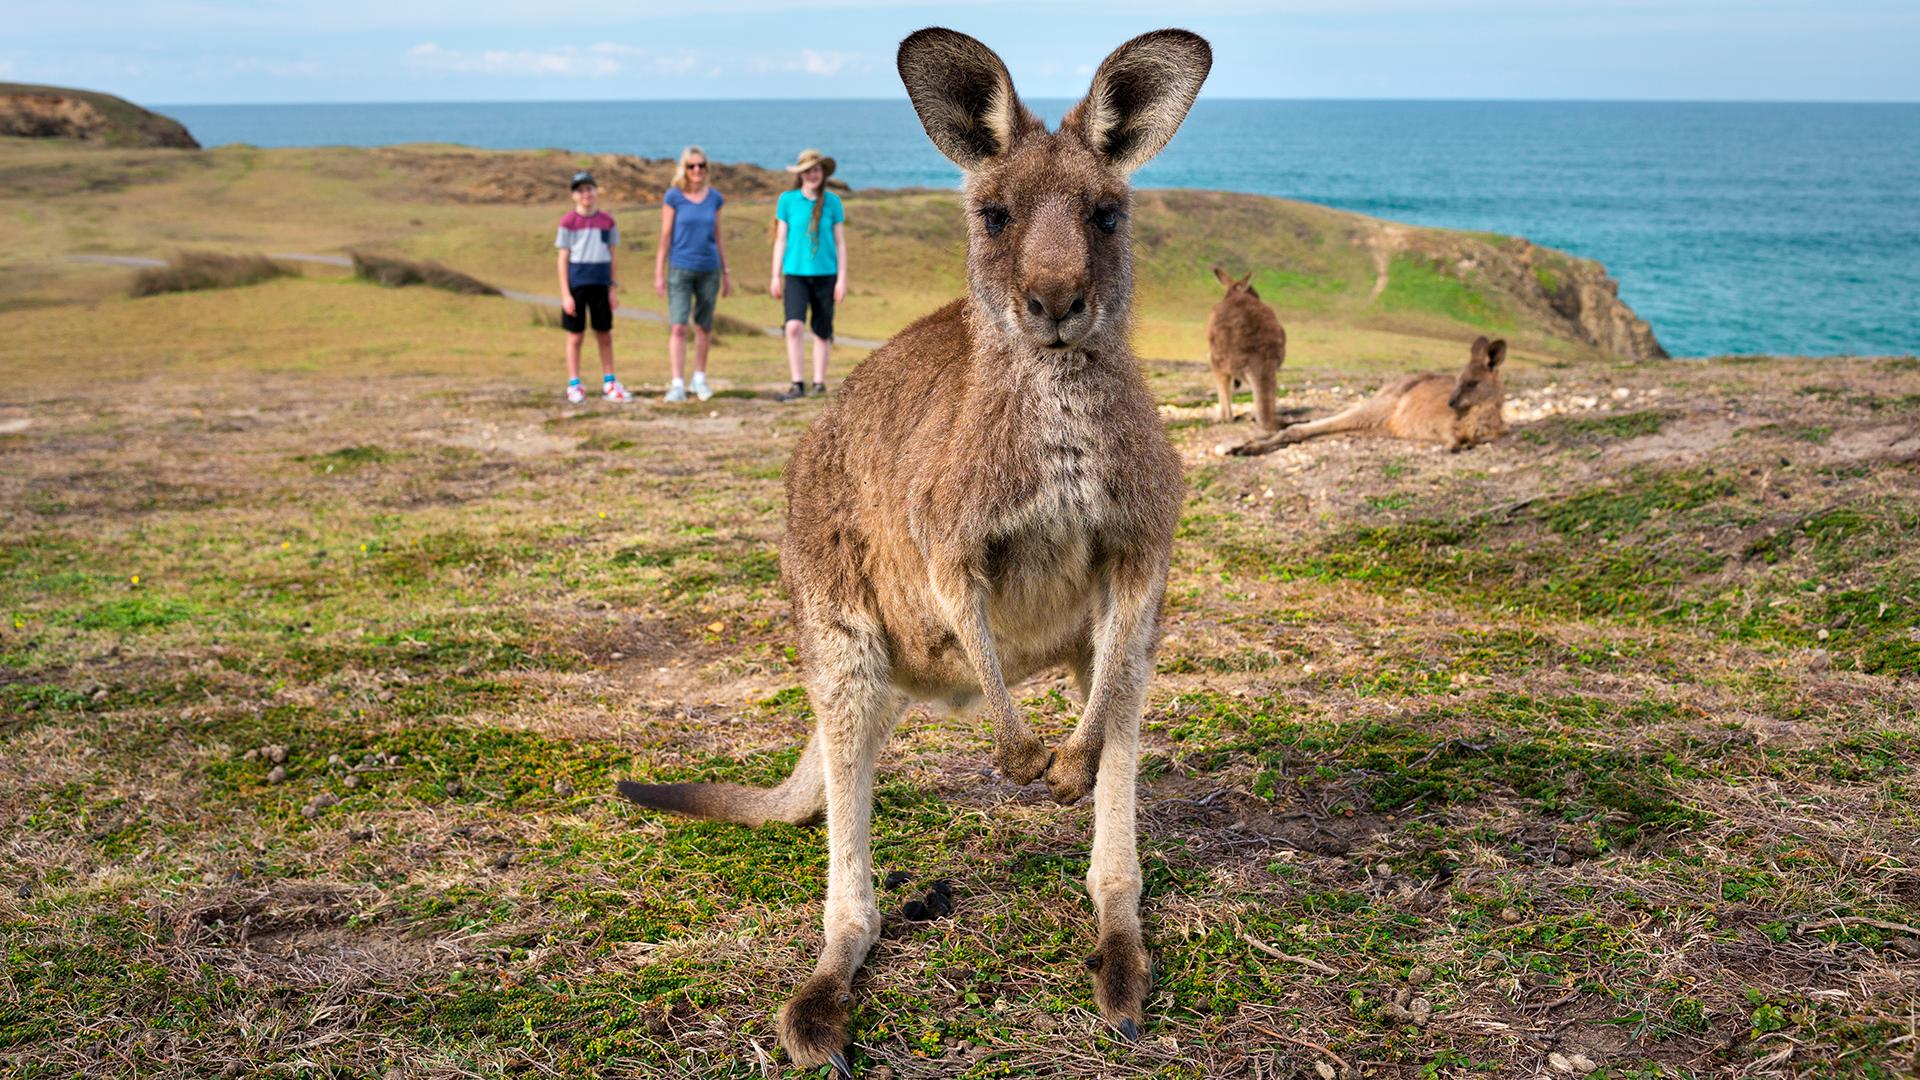 Kangaroos on the Coffs Coast